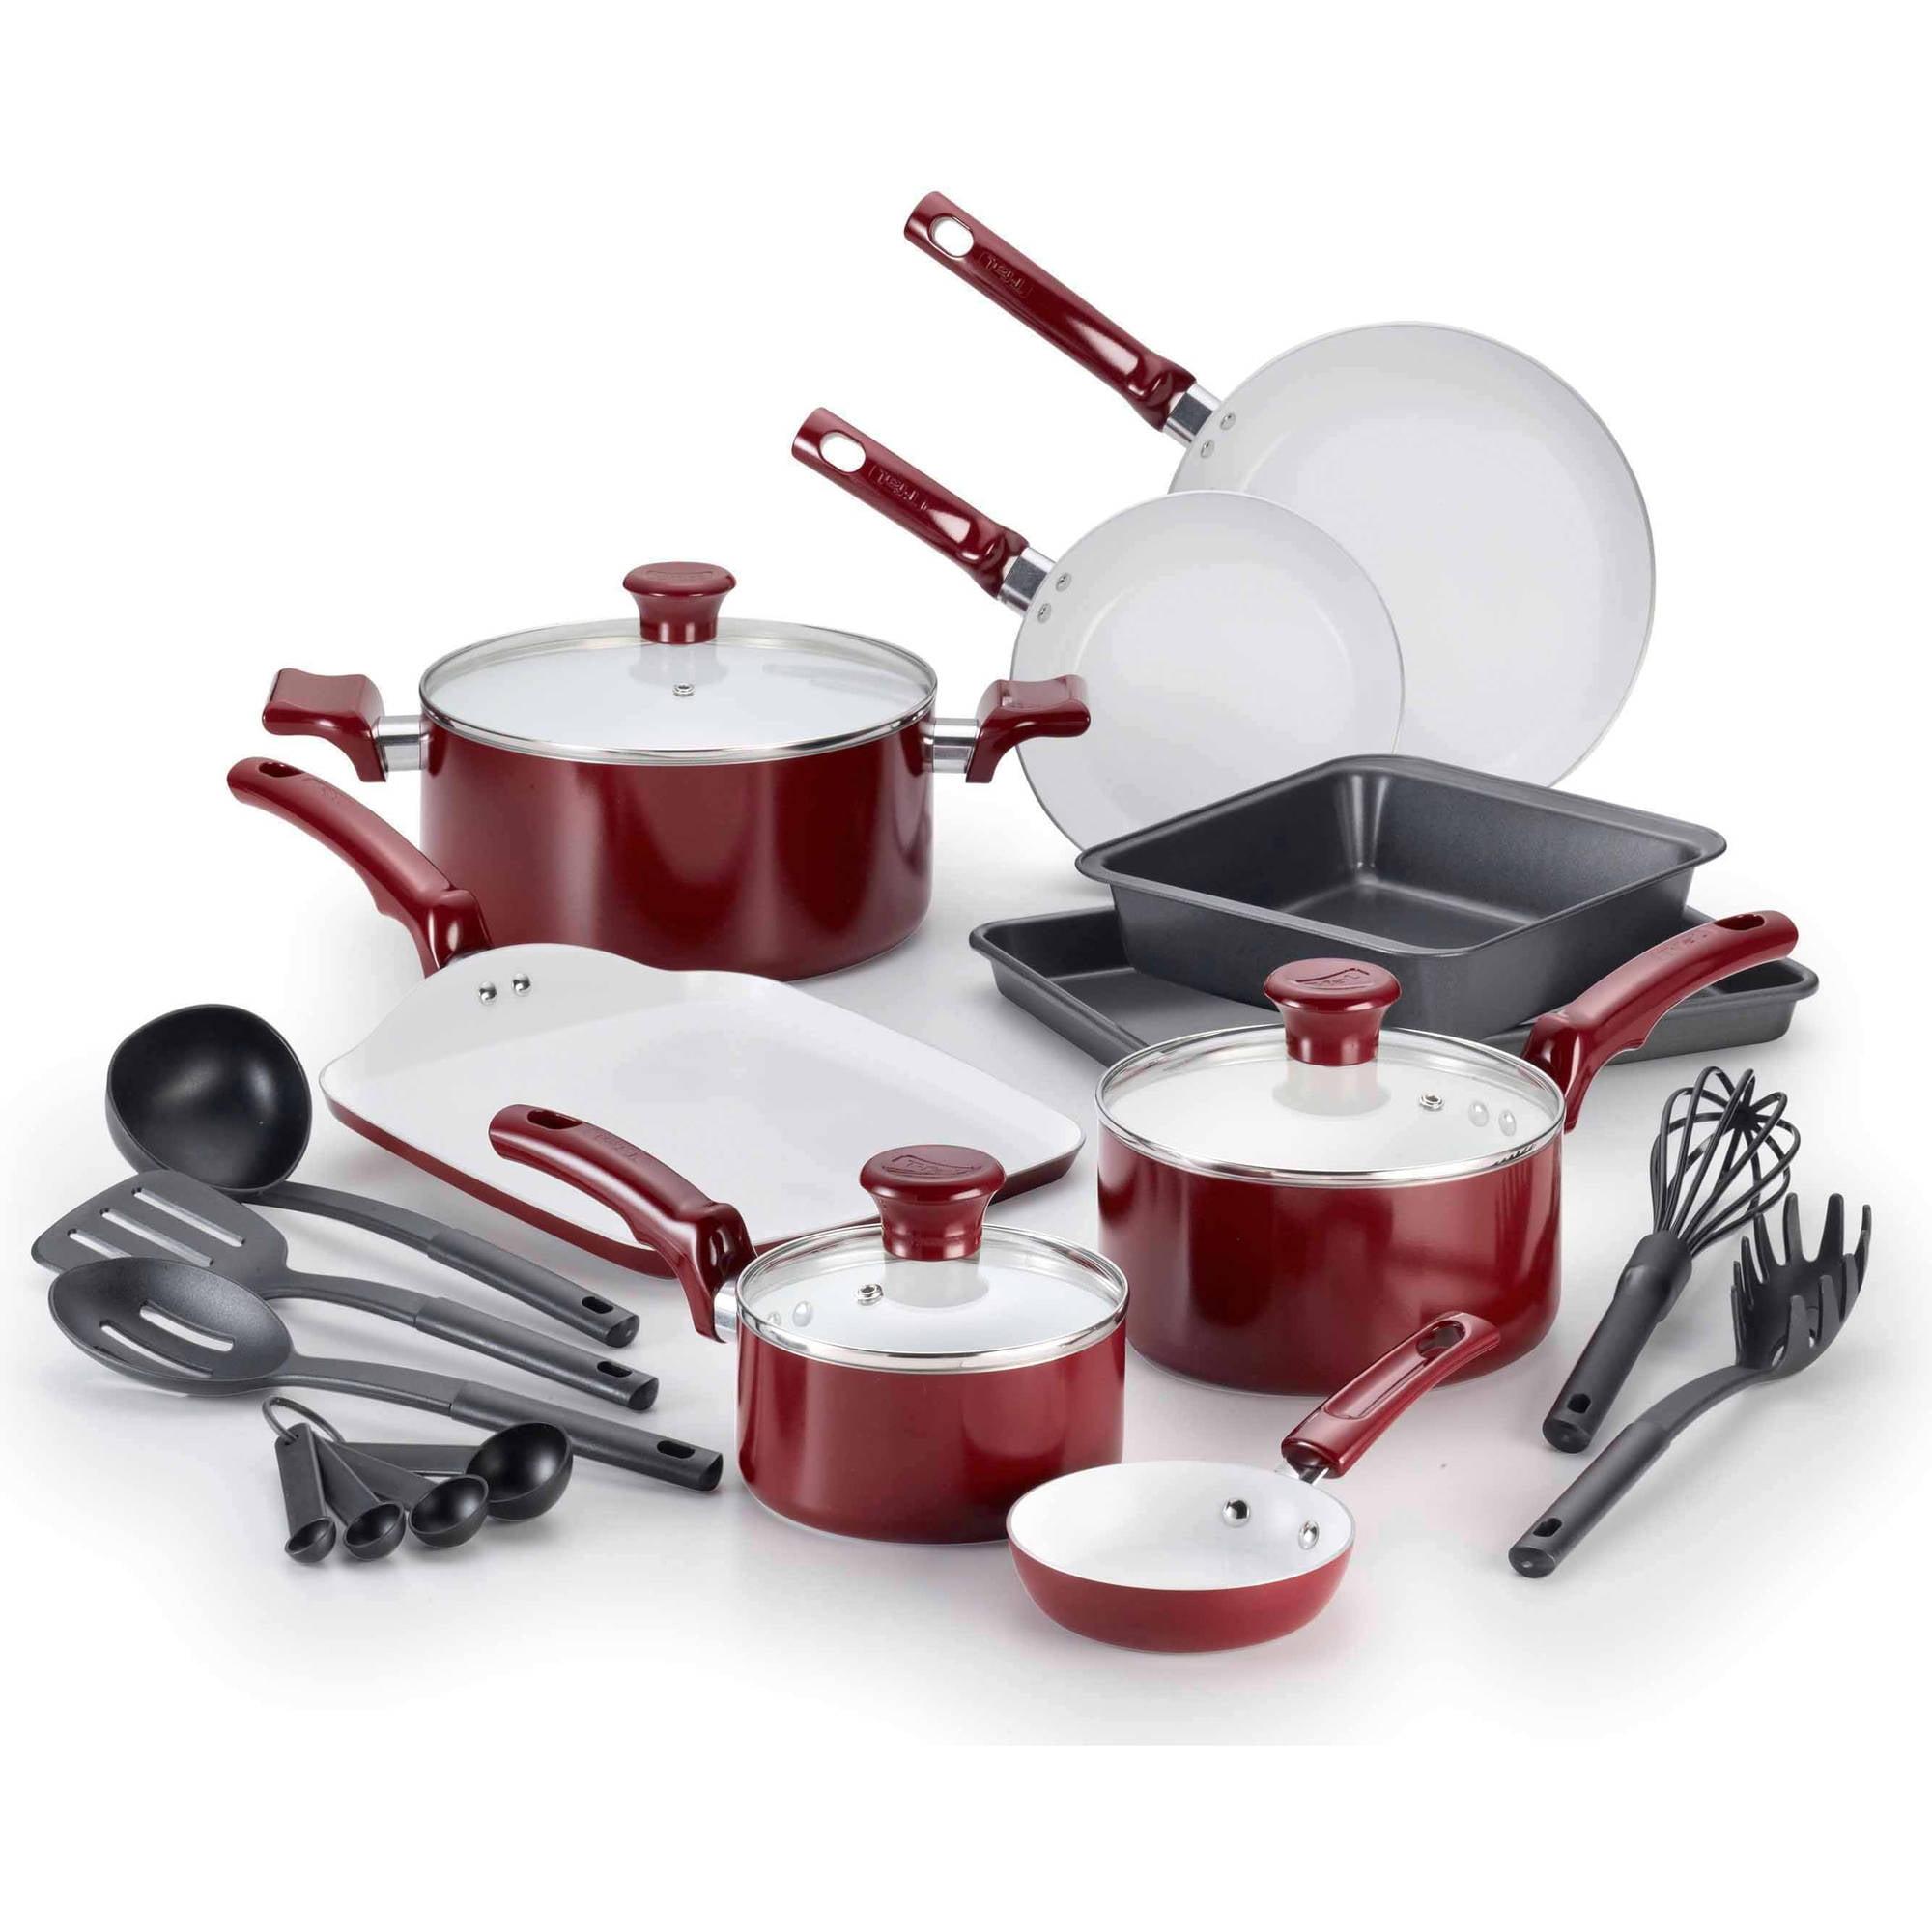 T-fal 18-Pc Ceramic Cookware Set - Walmart.com